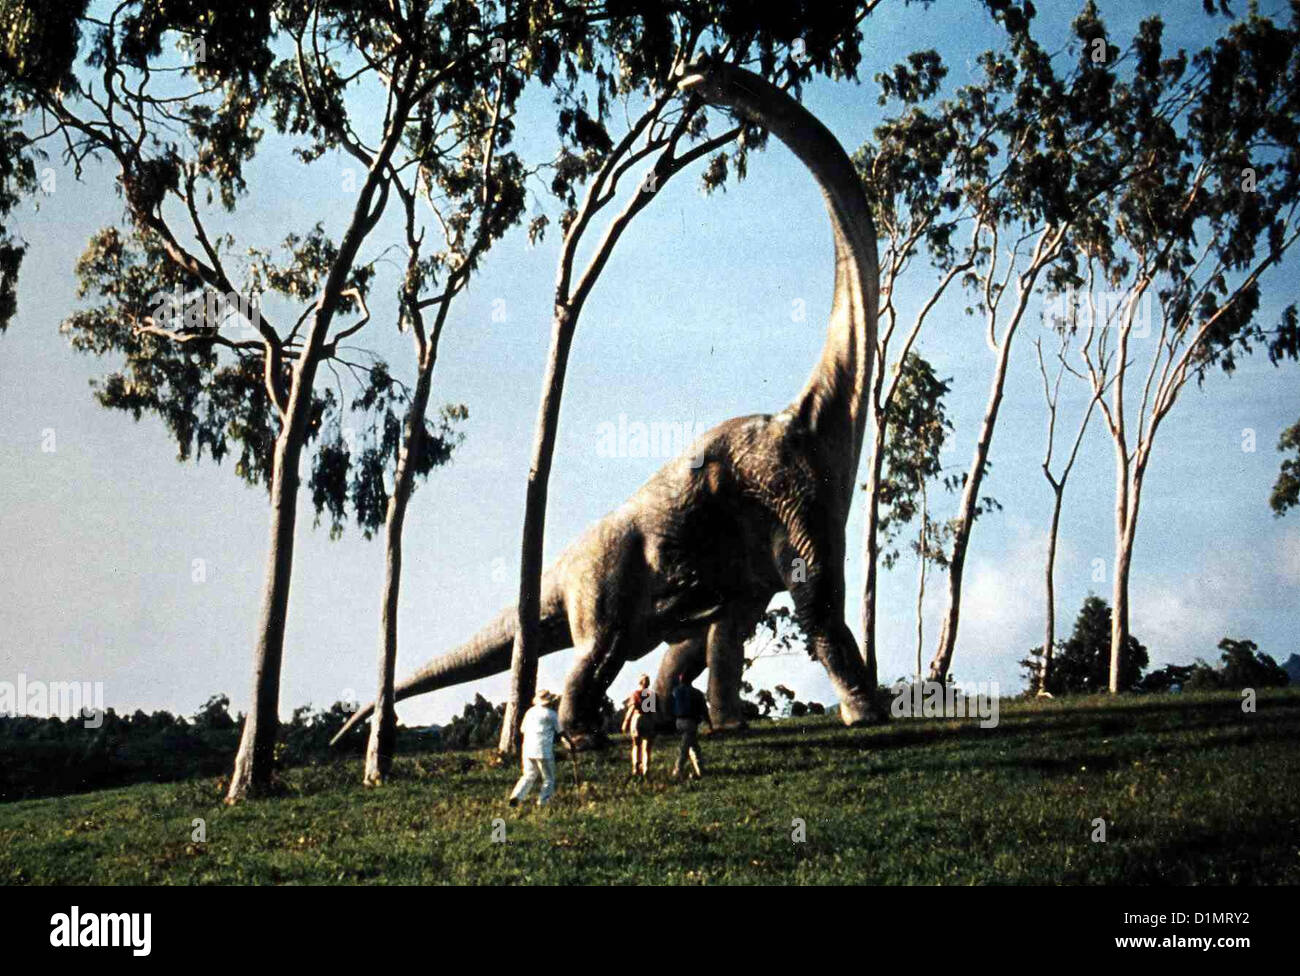 Jurassic Park  Jurassic Park - Hr  Richard Attenborough, Laura Dern, Sam Neill *** Local Caption *** 1993 Universal - Stock Image